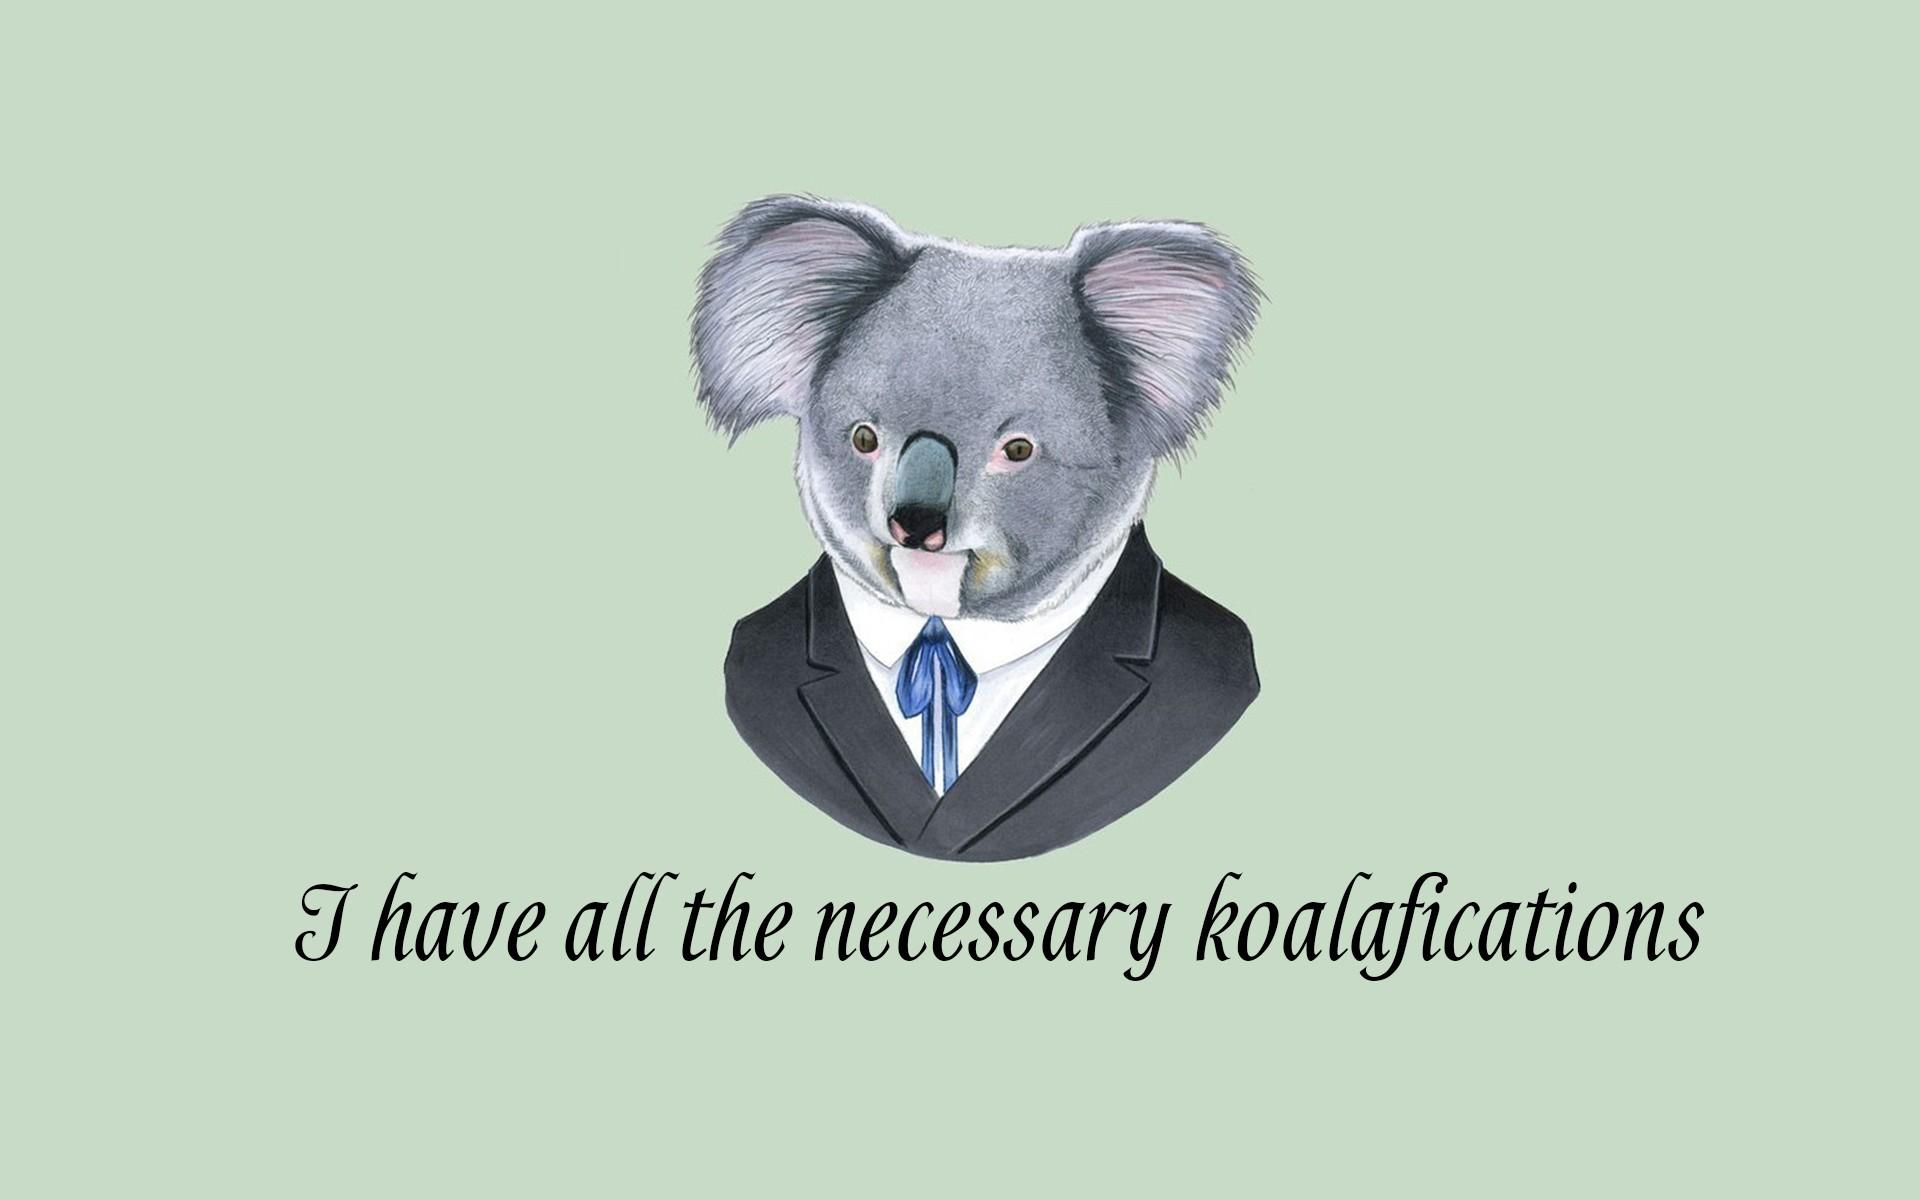 Good Wallpaper Koala Cartoon - illustration-quote-digital-art-animals-simple-background-minimalism-humor-text-cartoon-suits-koalas-marsupial-148187  Gallery_30516   .jpg